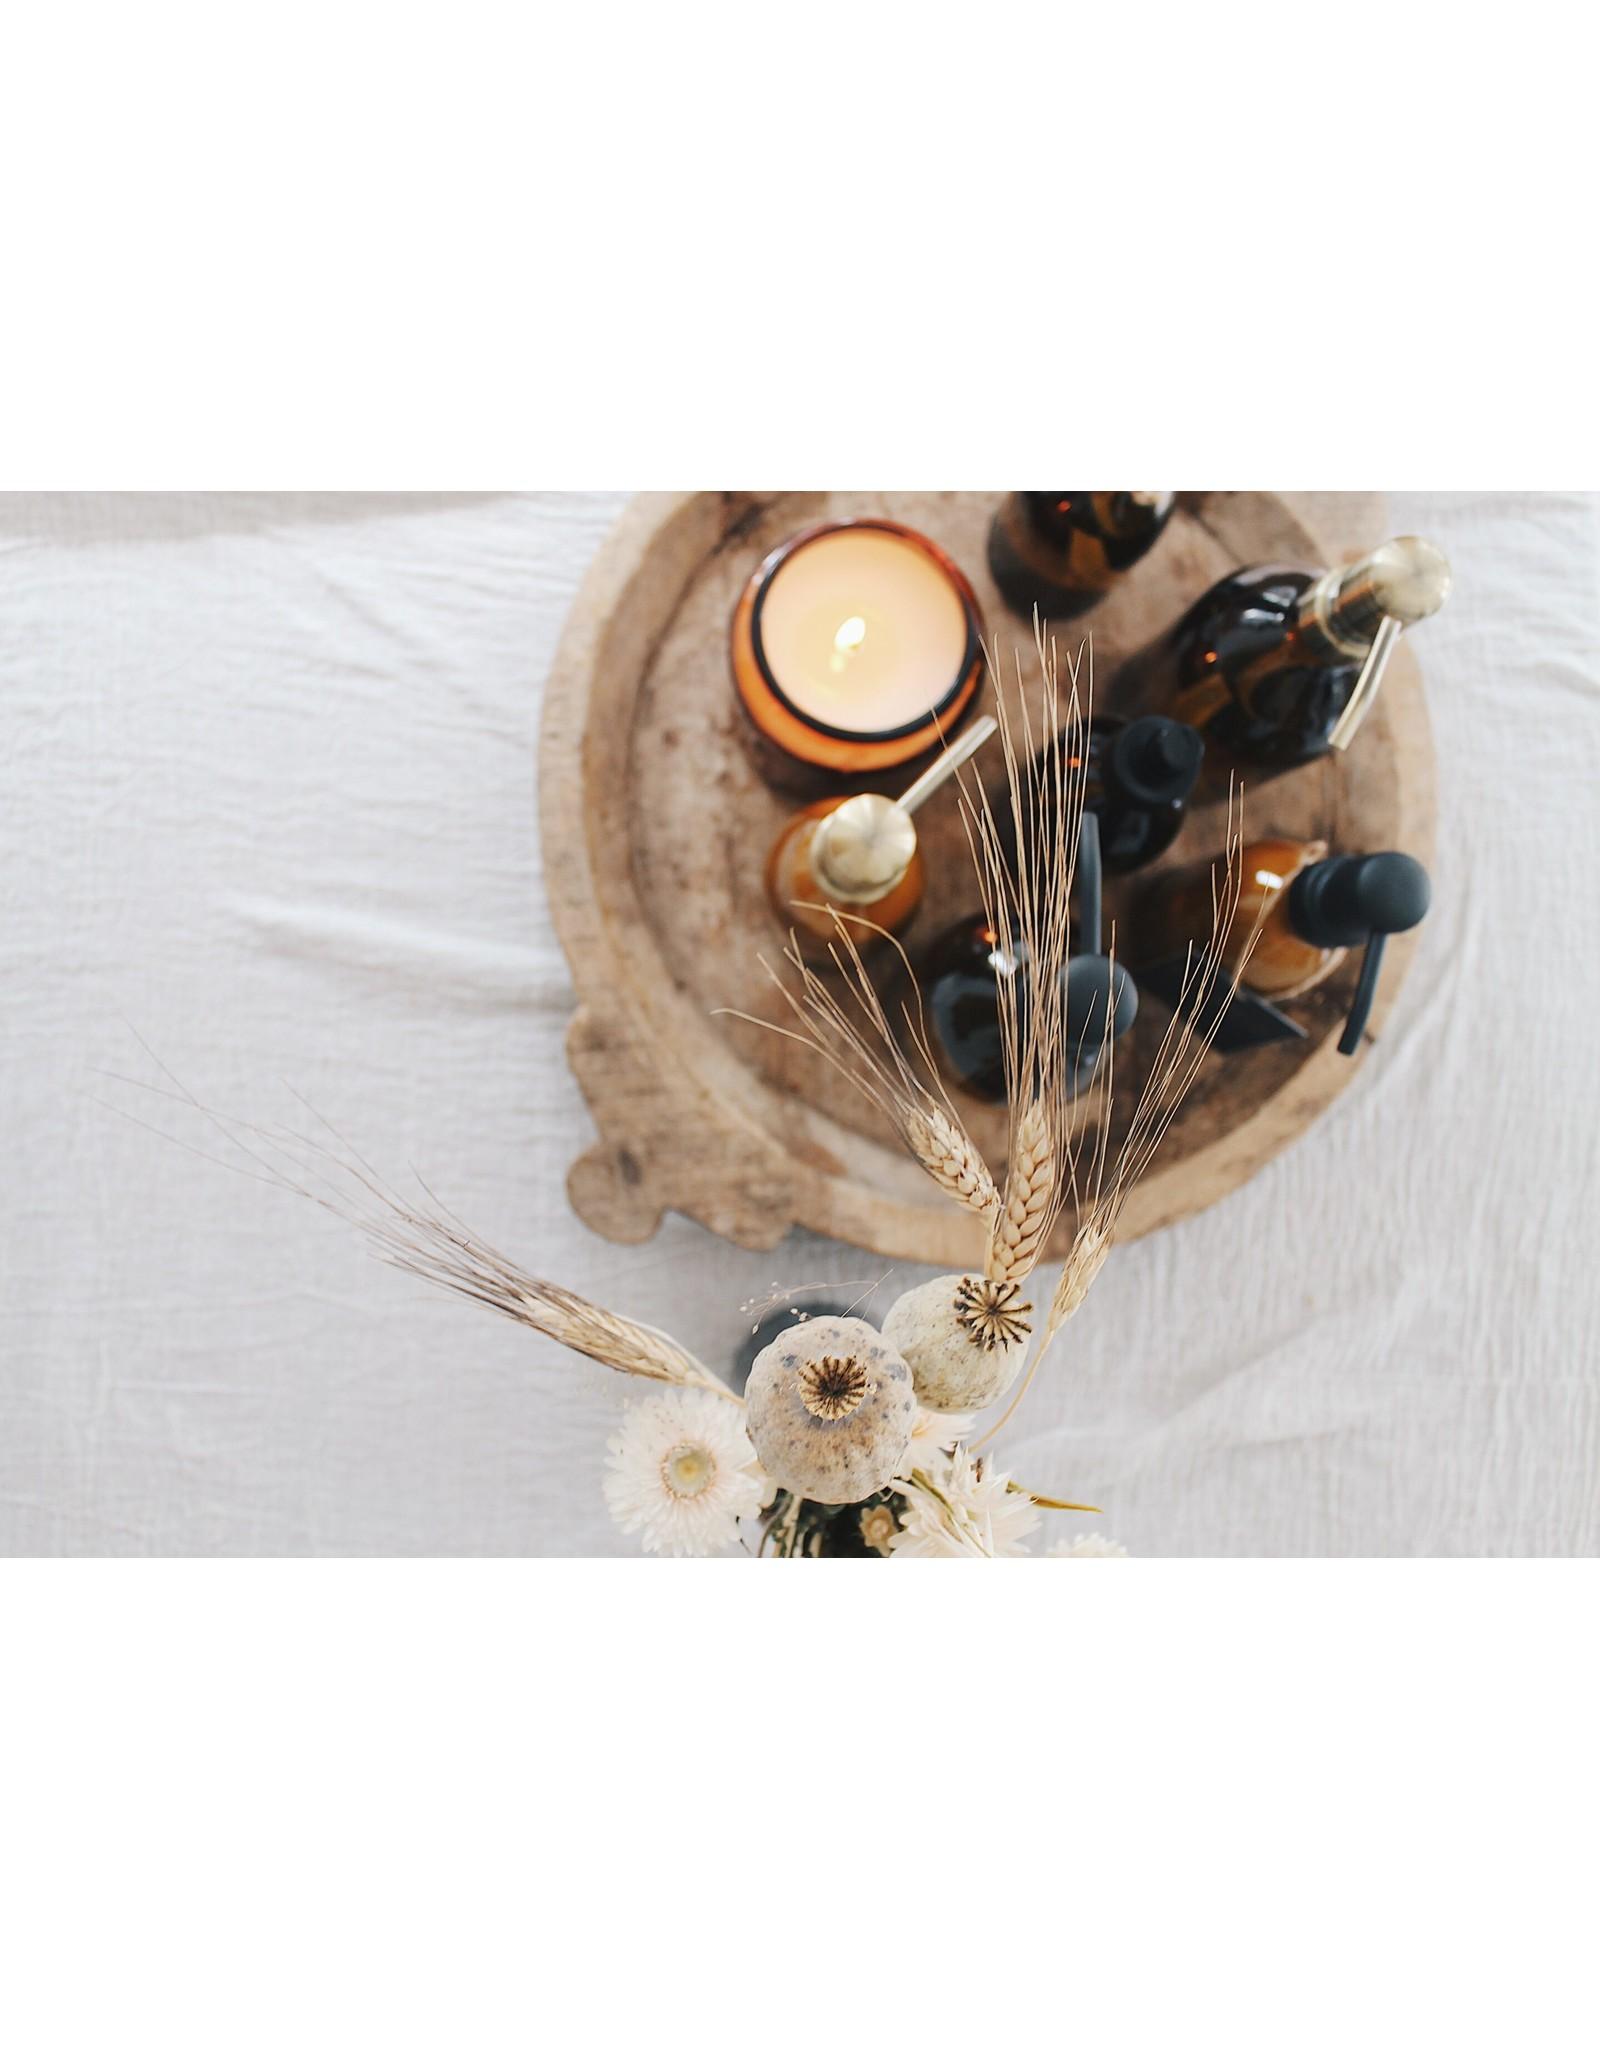 Handlotion bruin black 250ml 'Hand lotion'